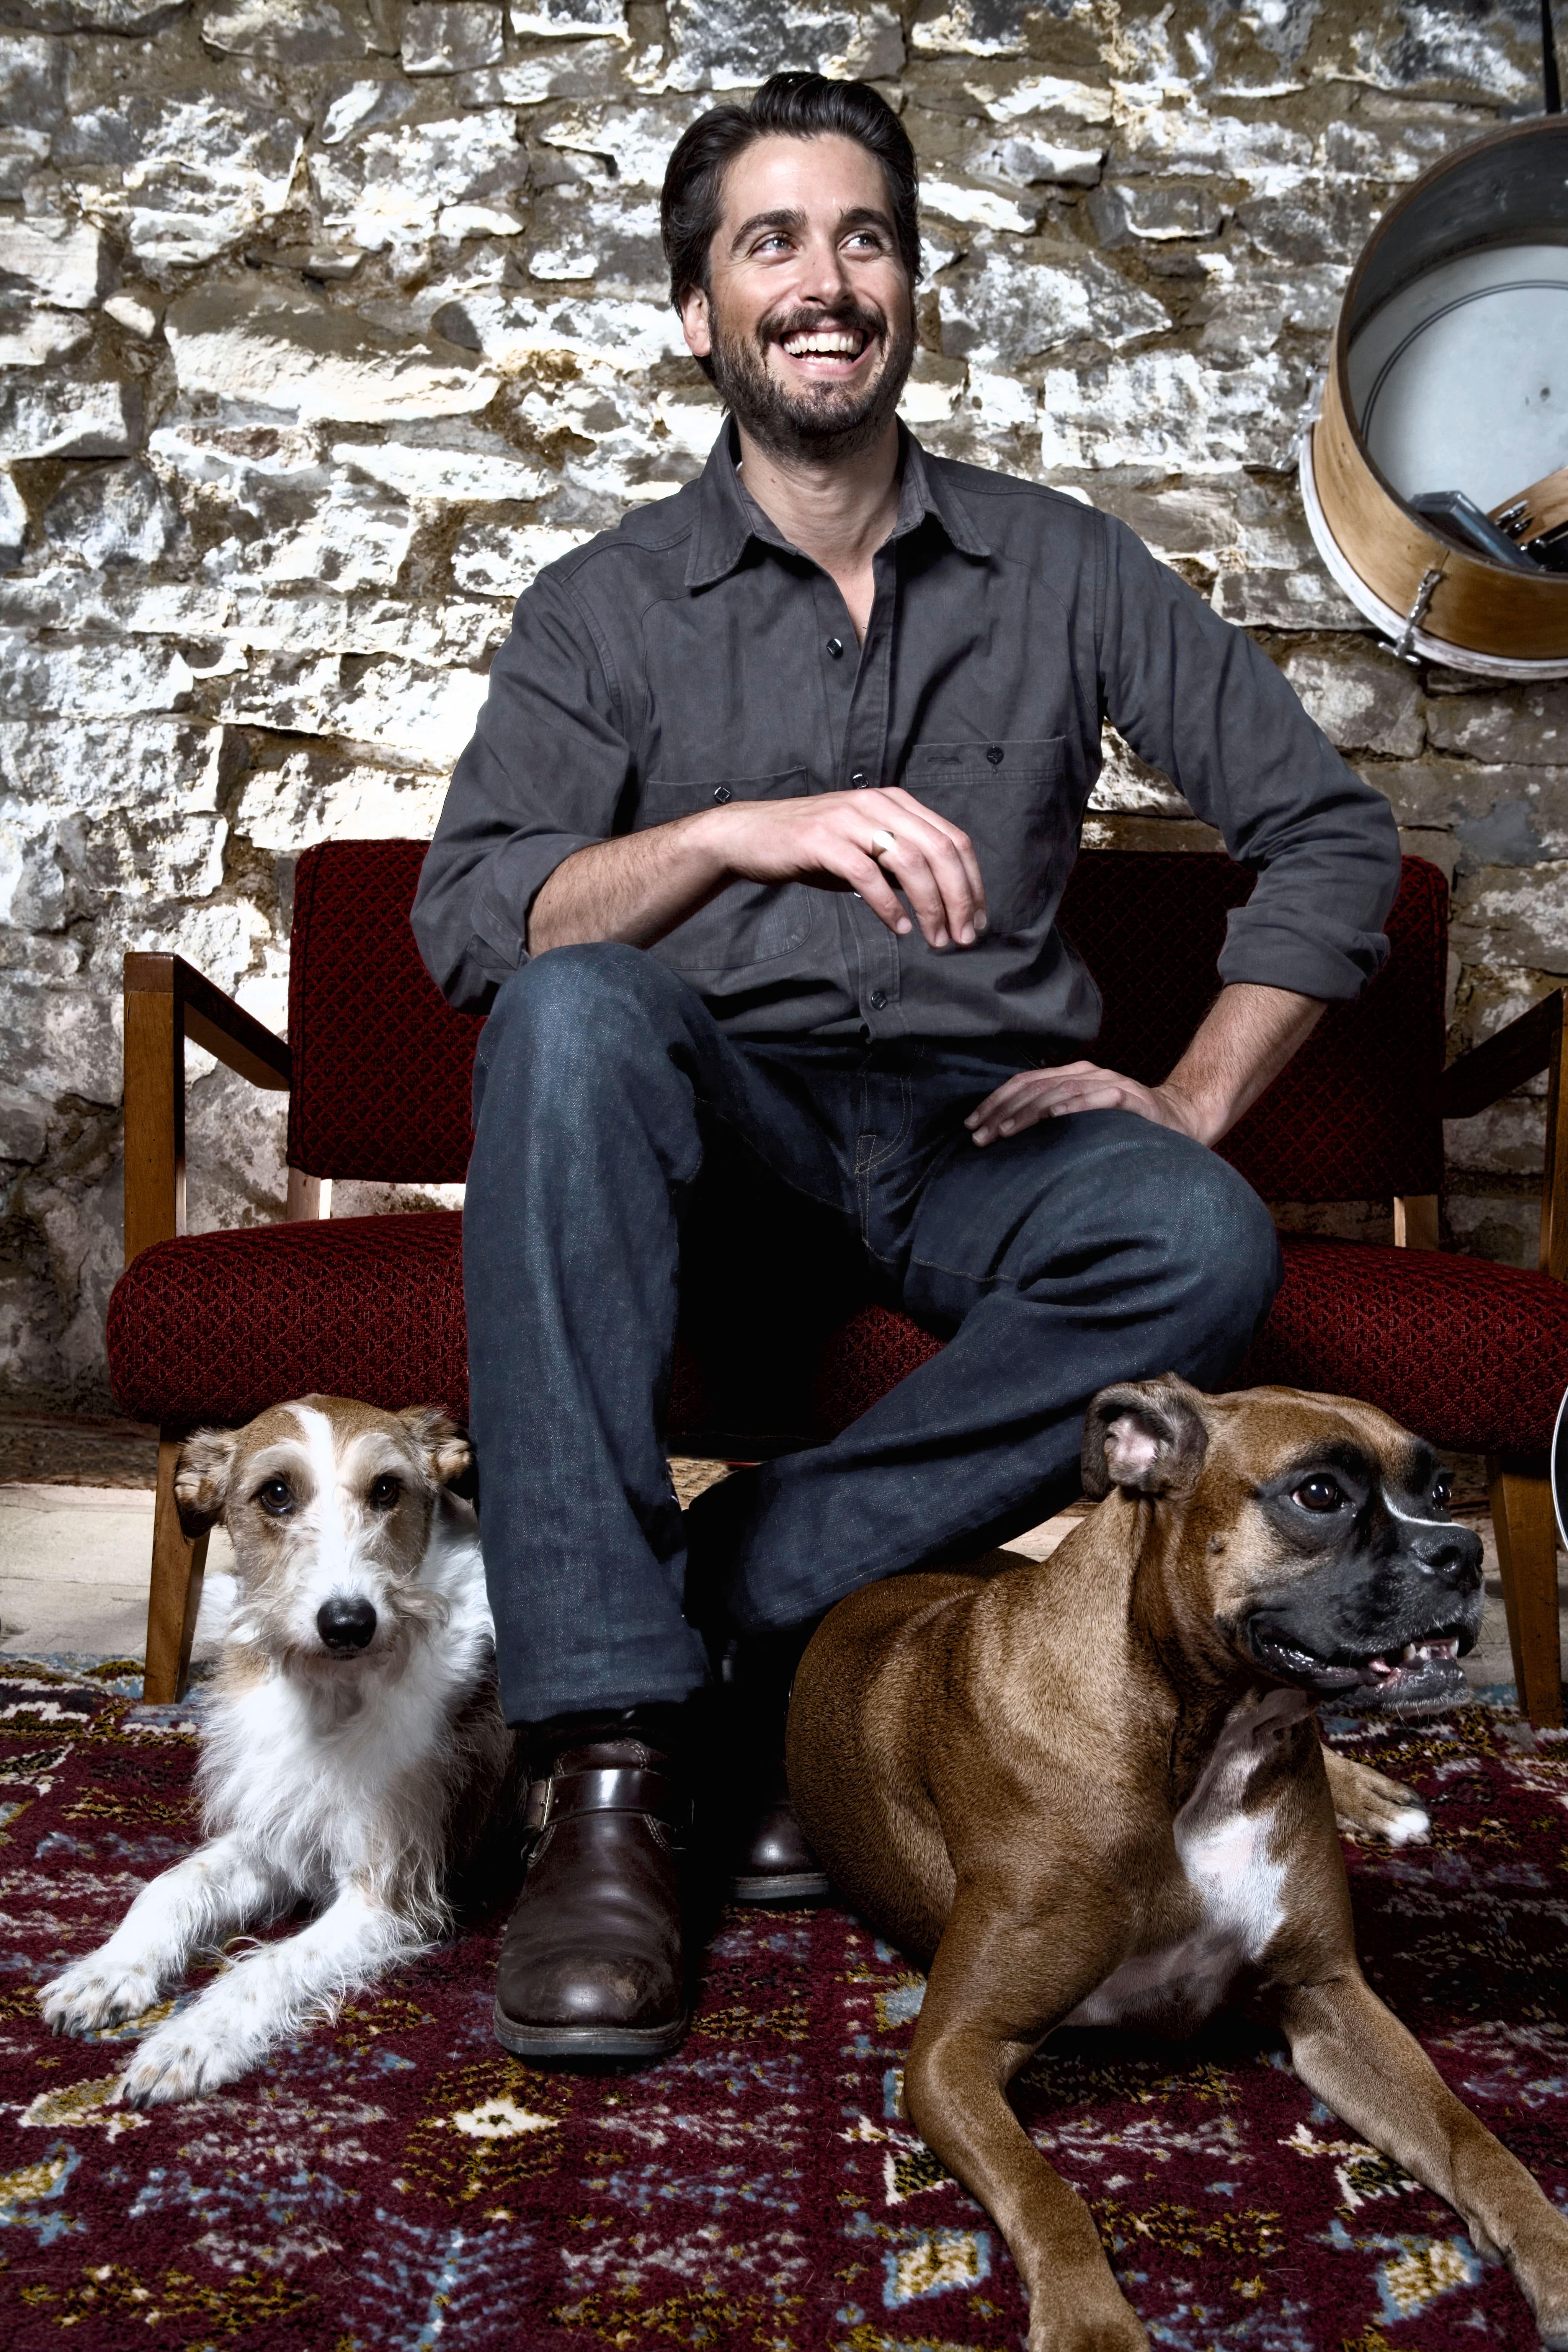 Canadian musician Peter Elkas